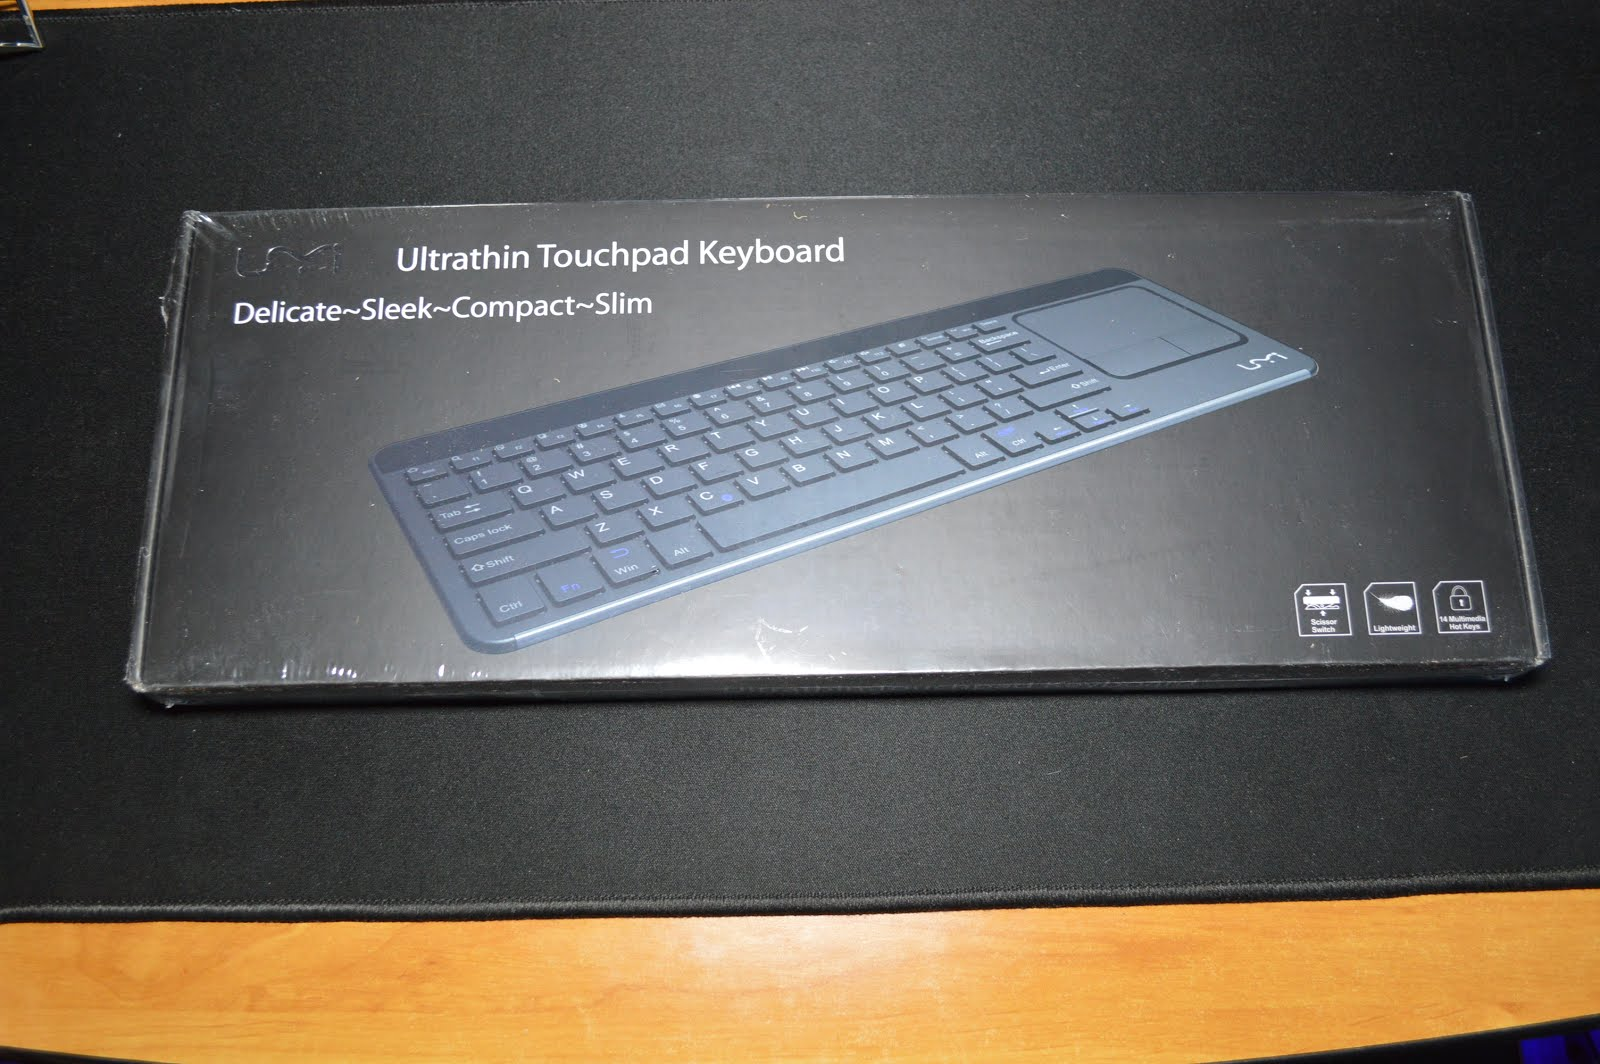 Tastiera wireless bluetooth umidigi kyb7 - Tastiera del letto ...